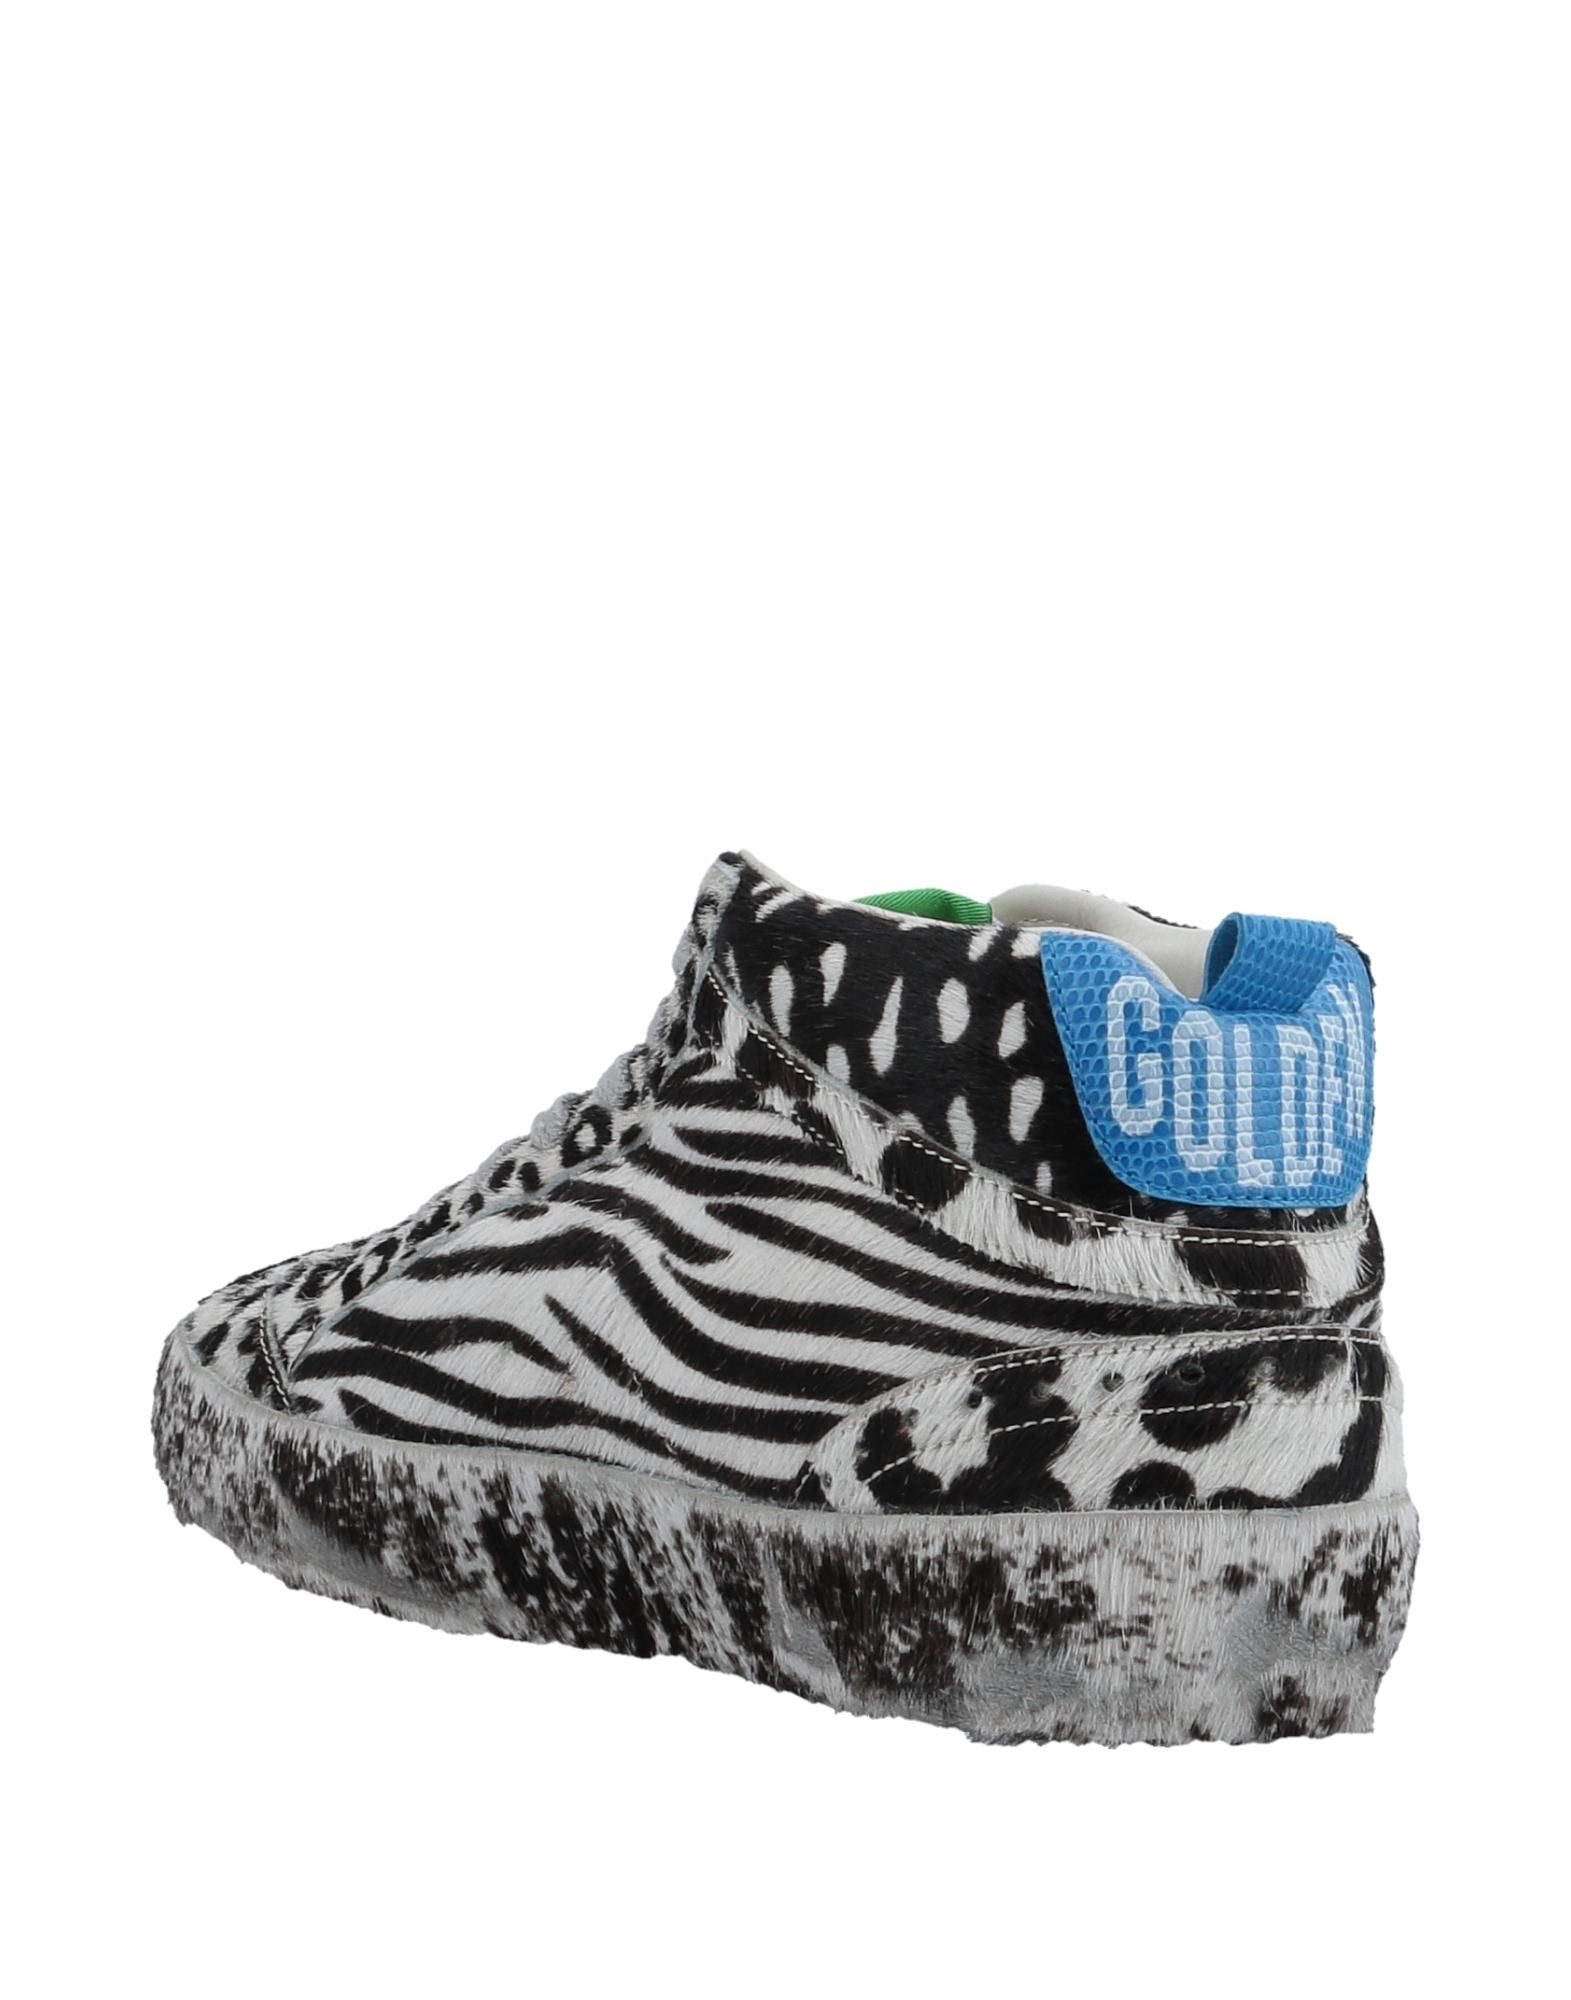 Golden Goose Gutes Deluxe Brand Sneakers Herren Gutes Goose Preis-Leistungs-Verhältnis, es lohnt sich 2a3ef3